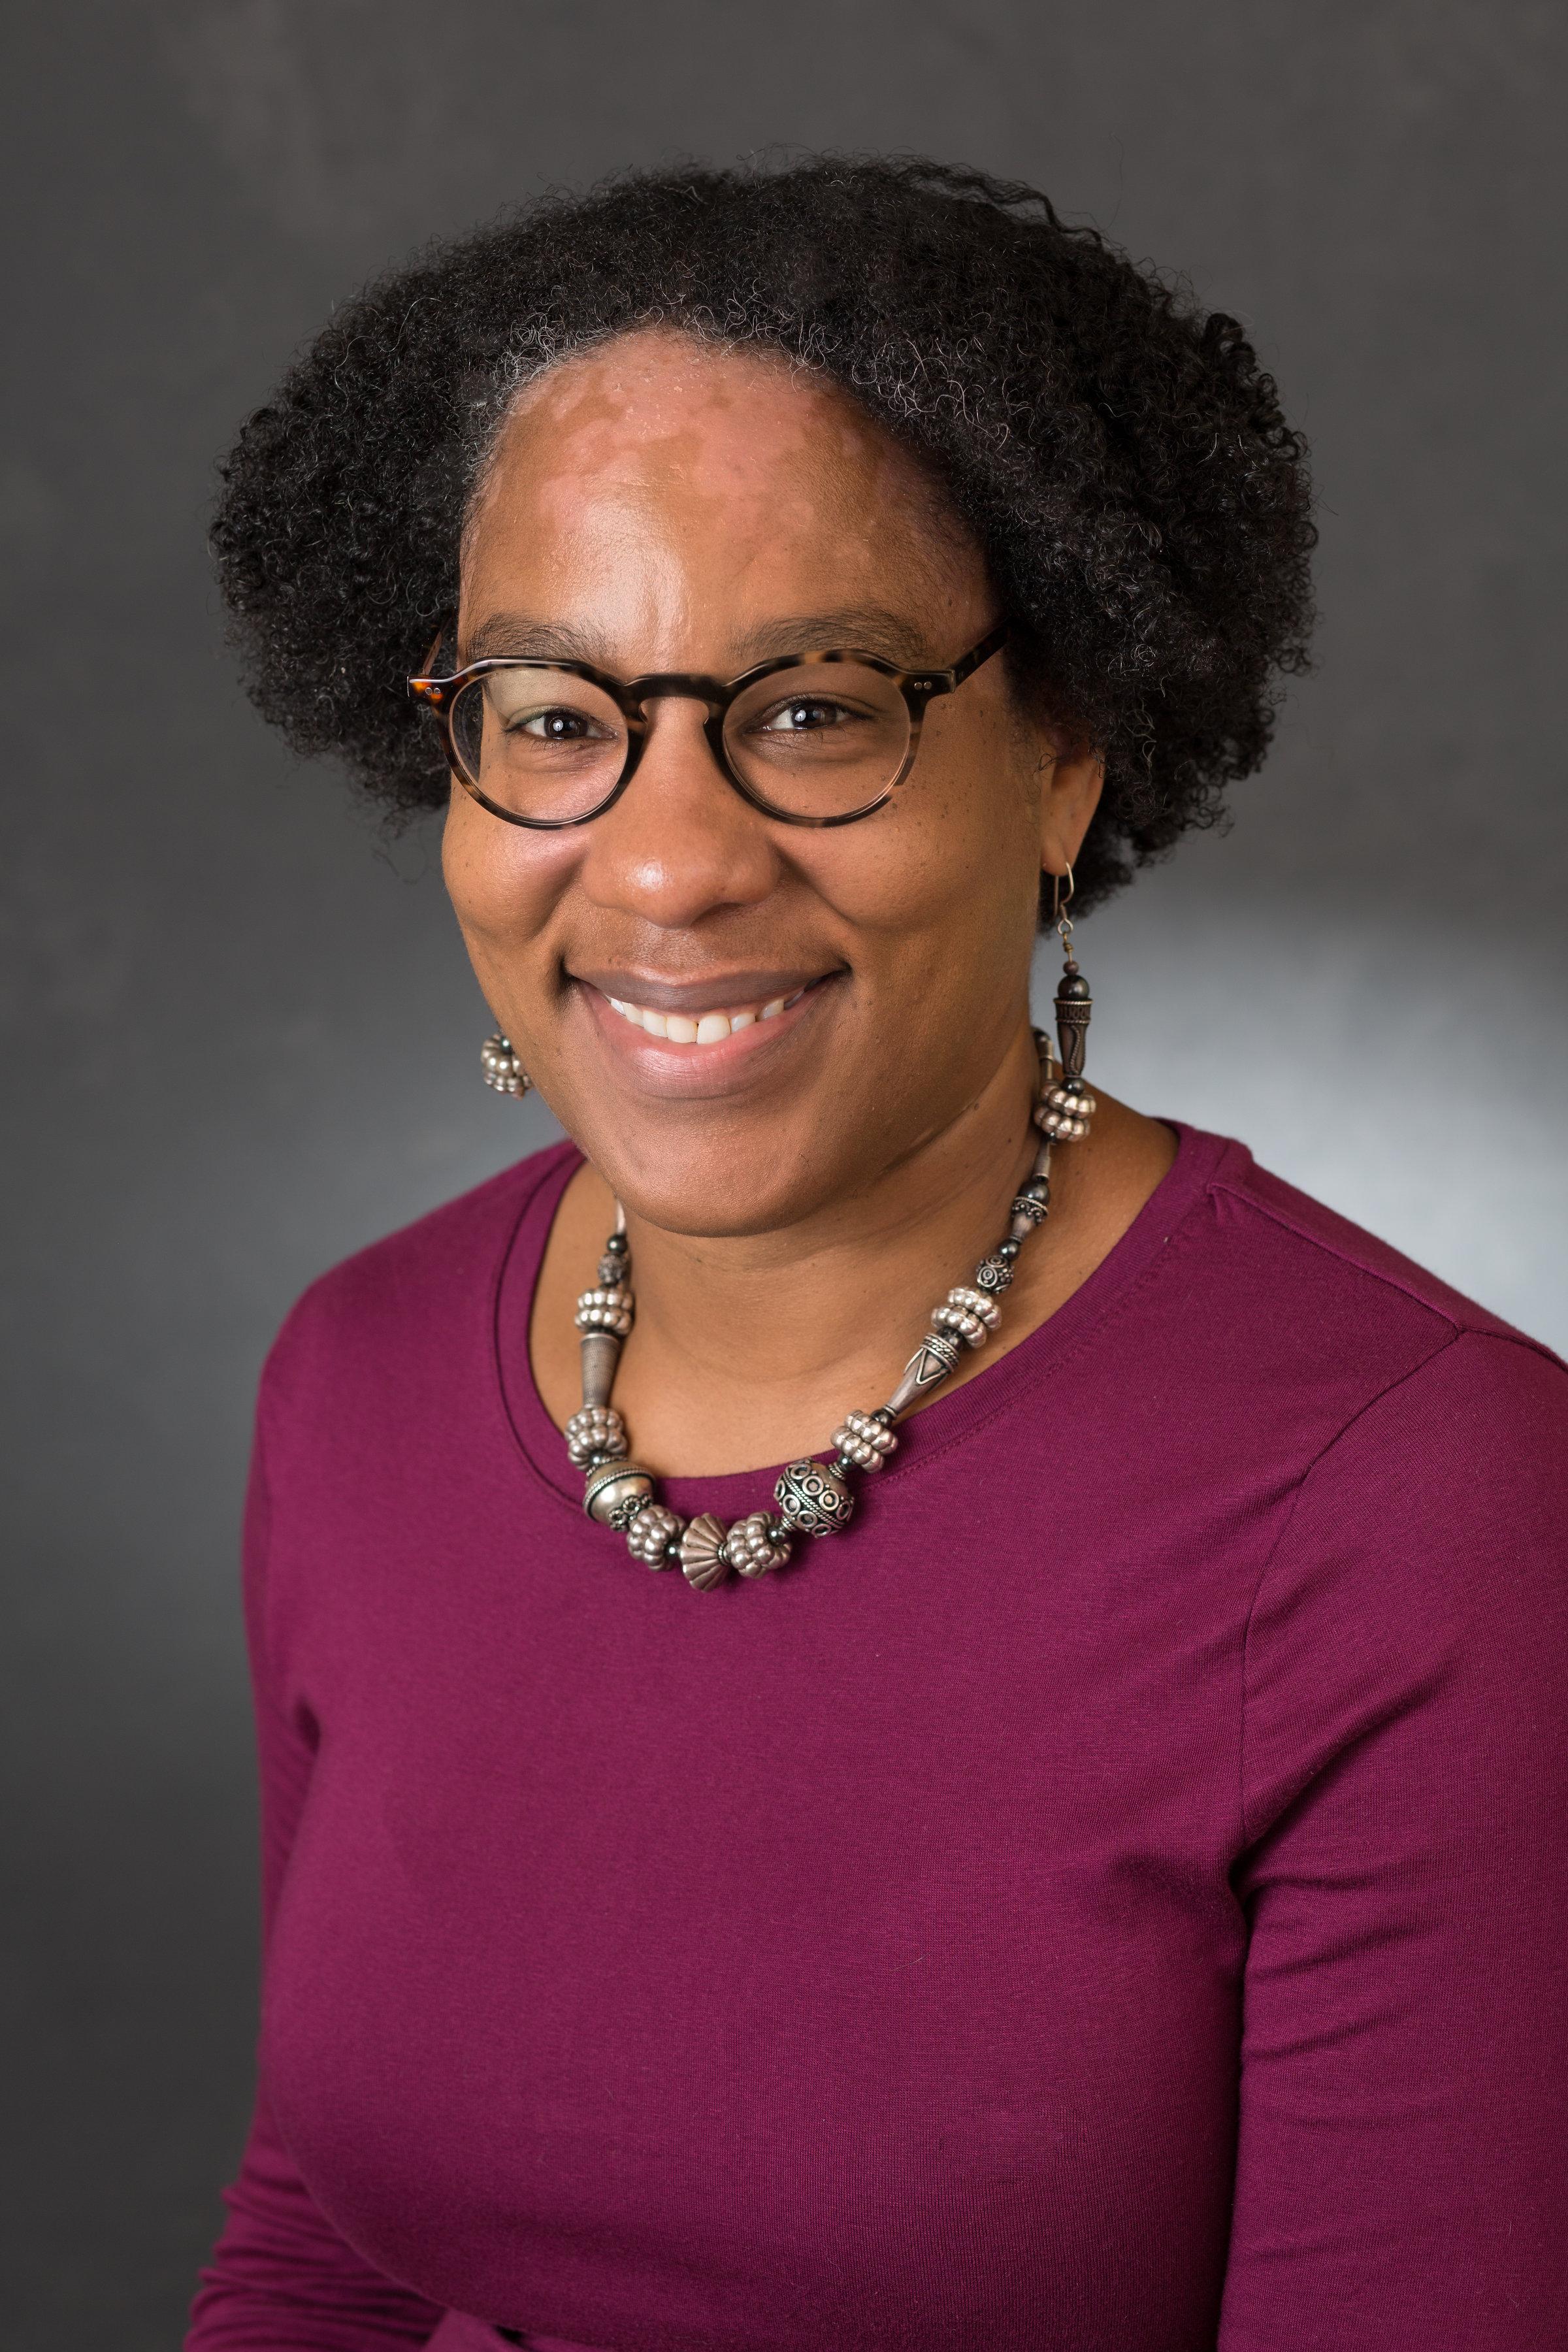 Monica R. McLemore, RN, MPH, PhD